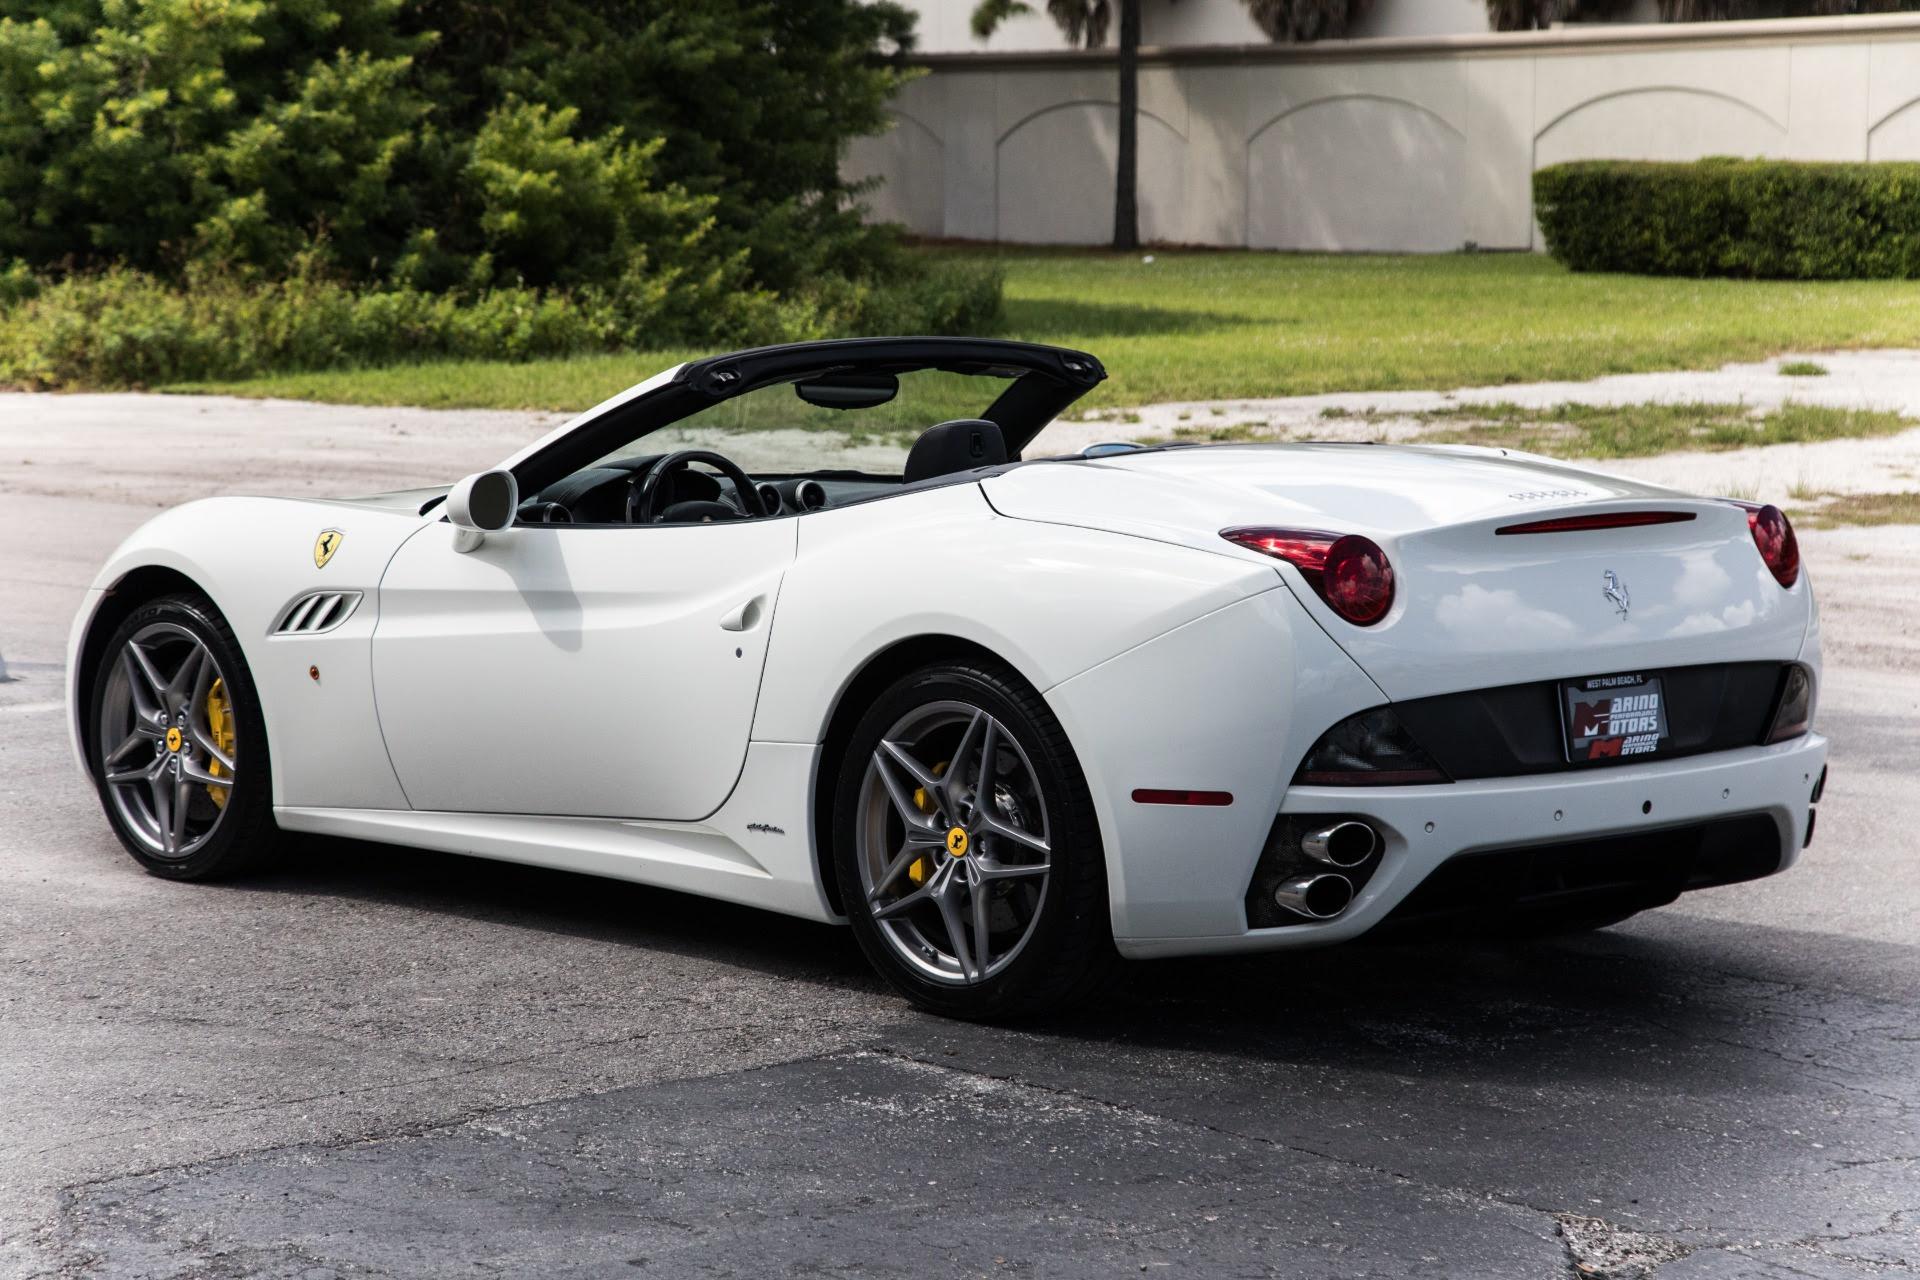 Used 2013 Ferrari California For Sale ($94,900)   Marino ...